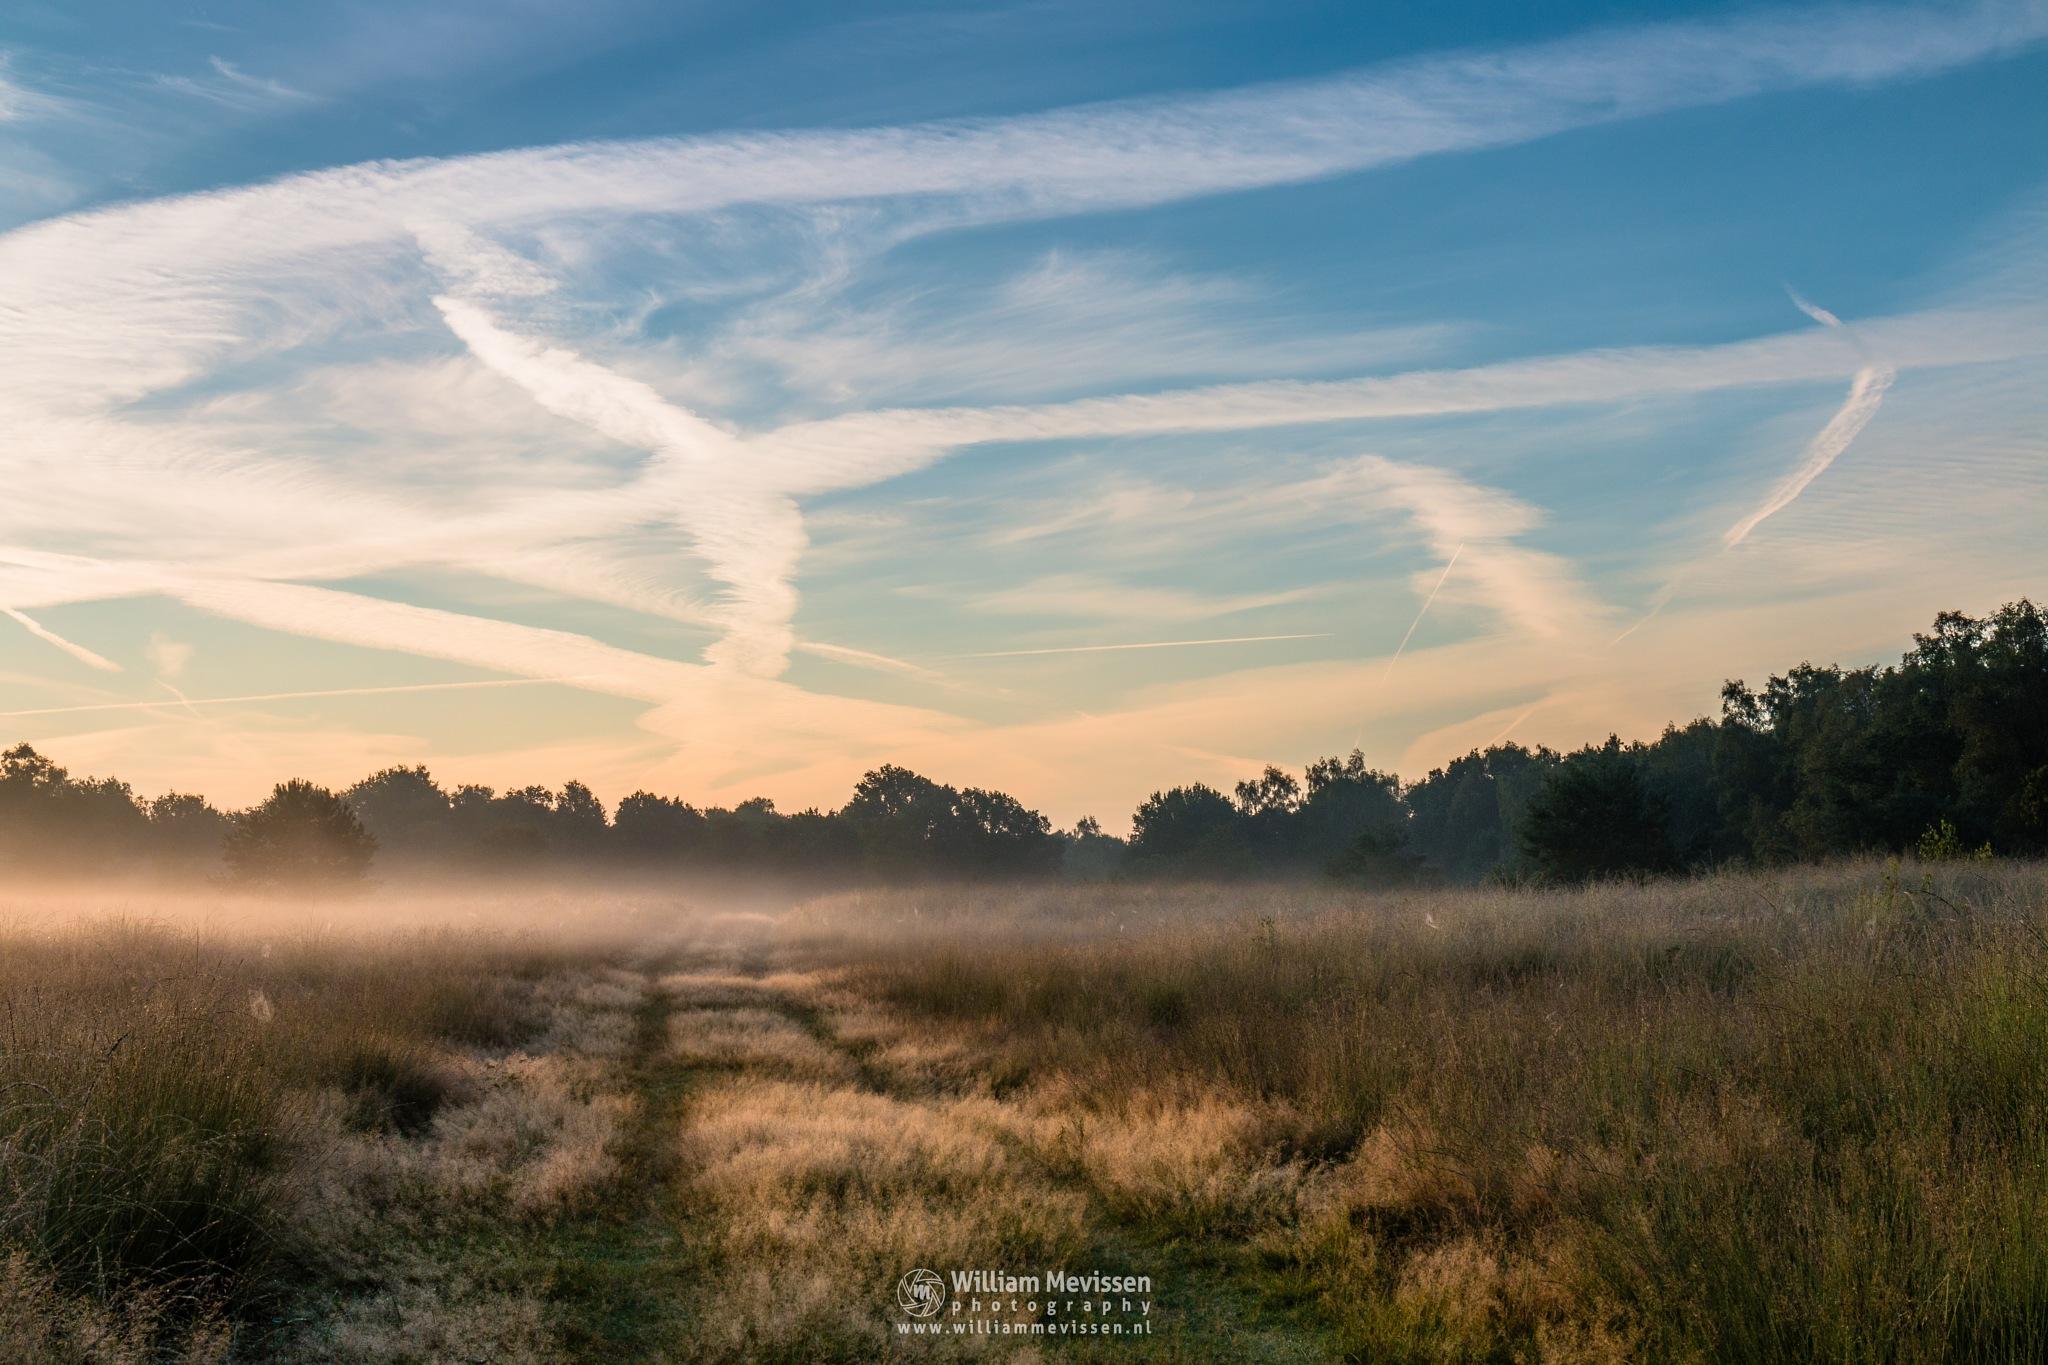 Misty Sunlight by William Mevissen